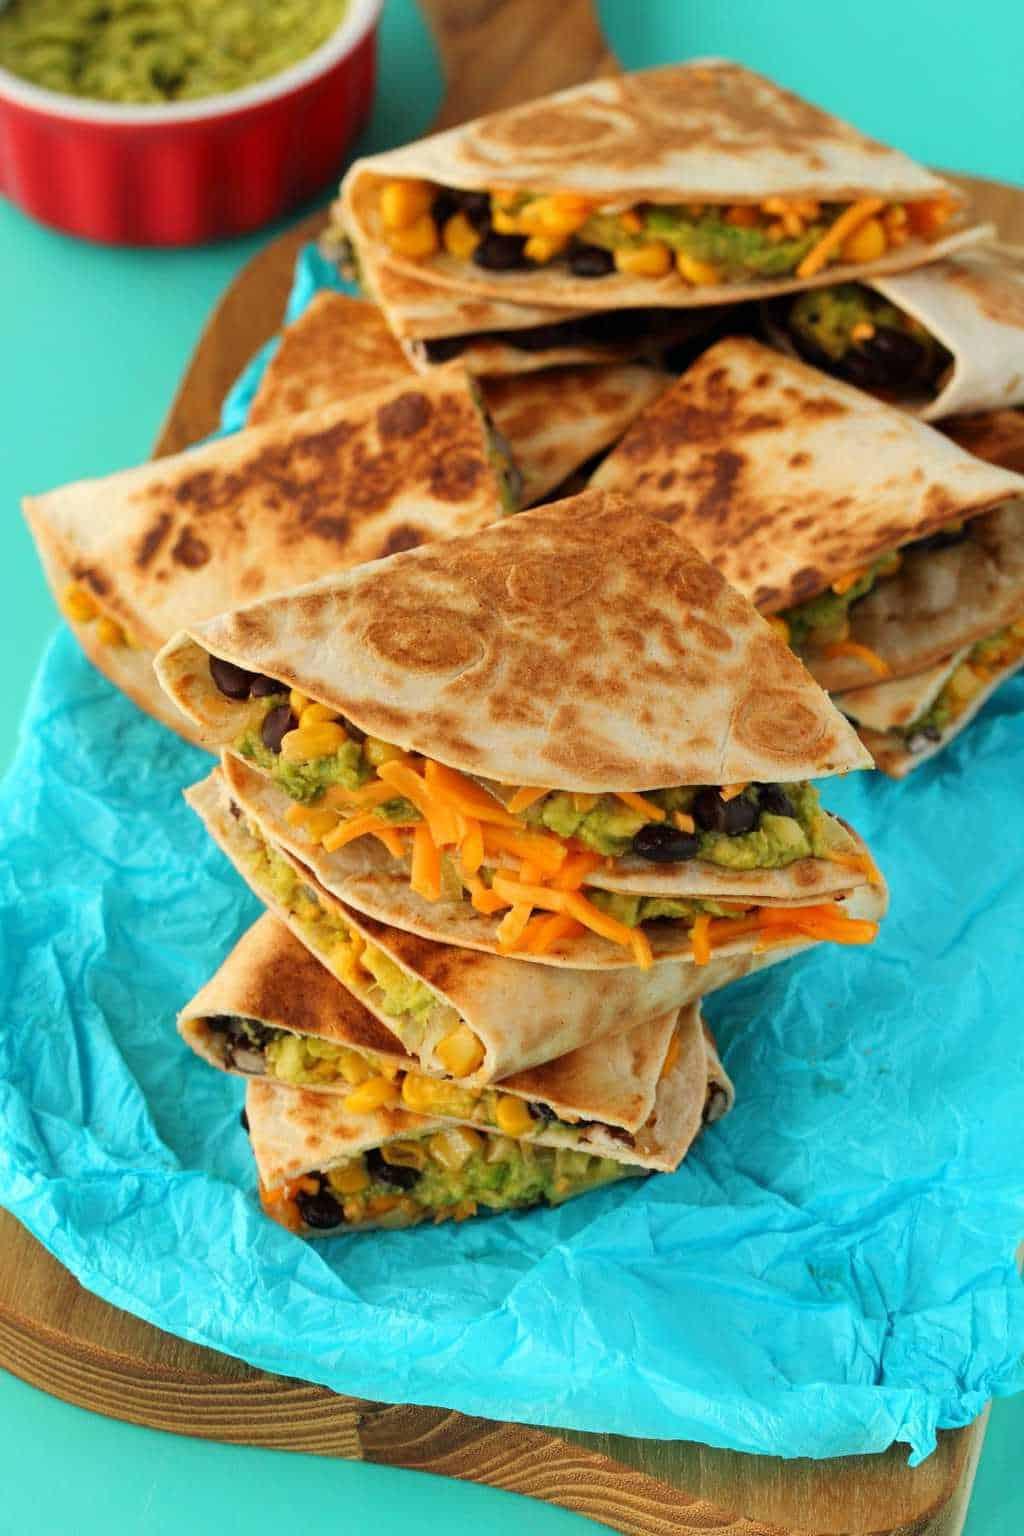 Vegan Quesadillas Easy Cheesy And Delicious Loving It Vegan